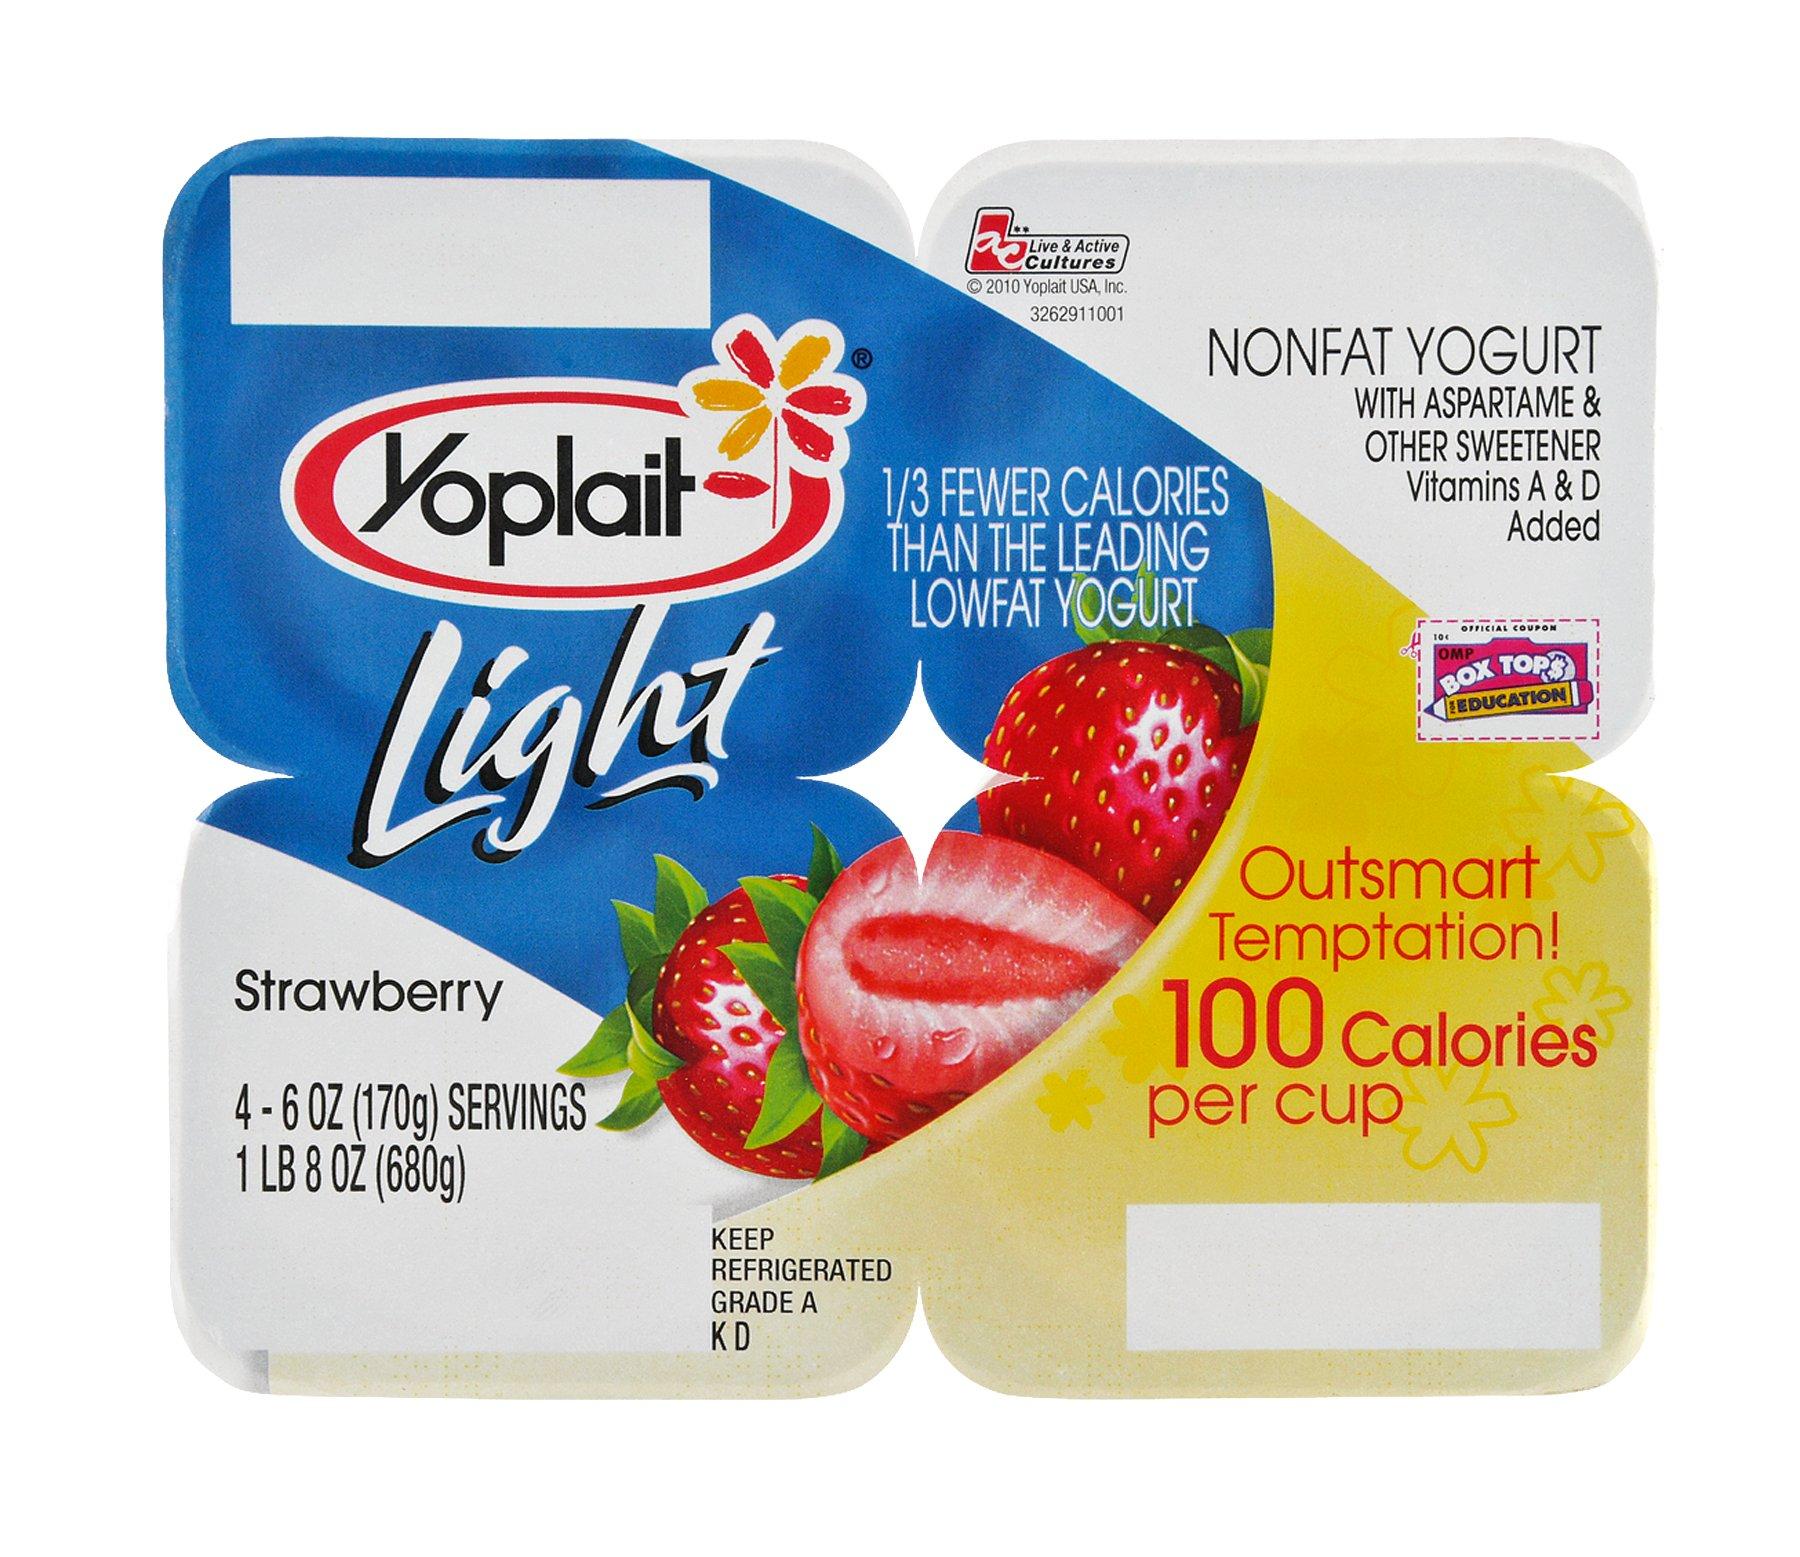 Yoplait Light Fat Free Strawberry